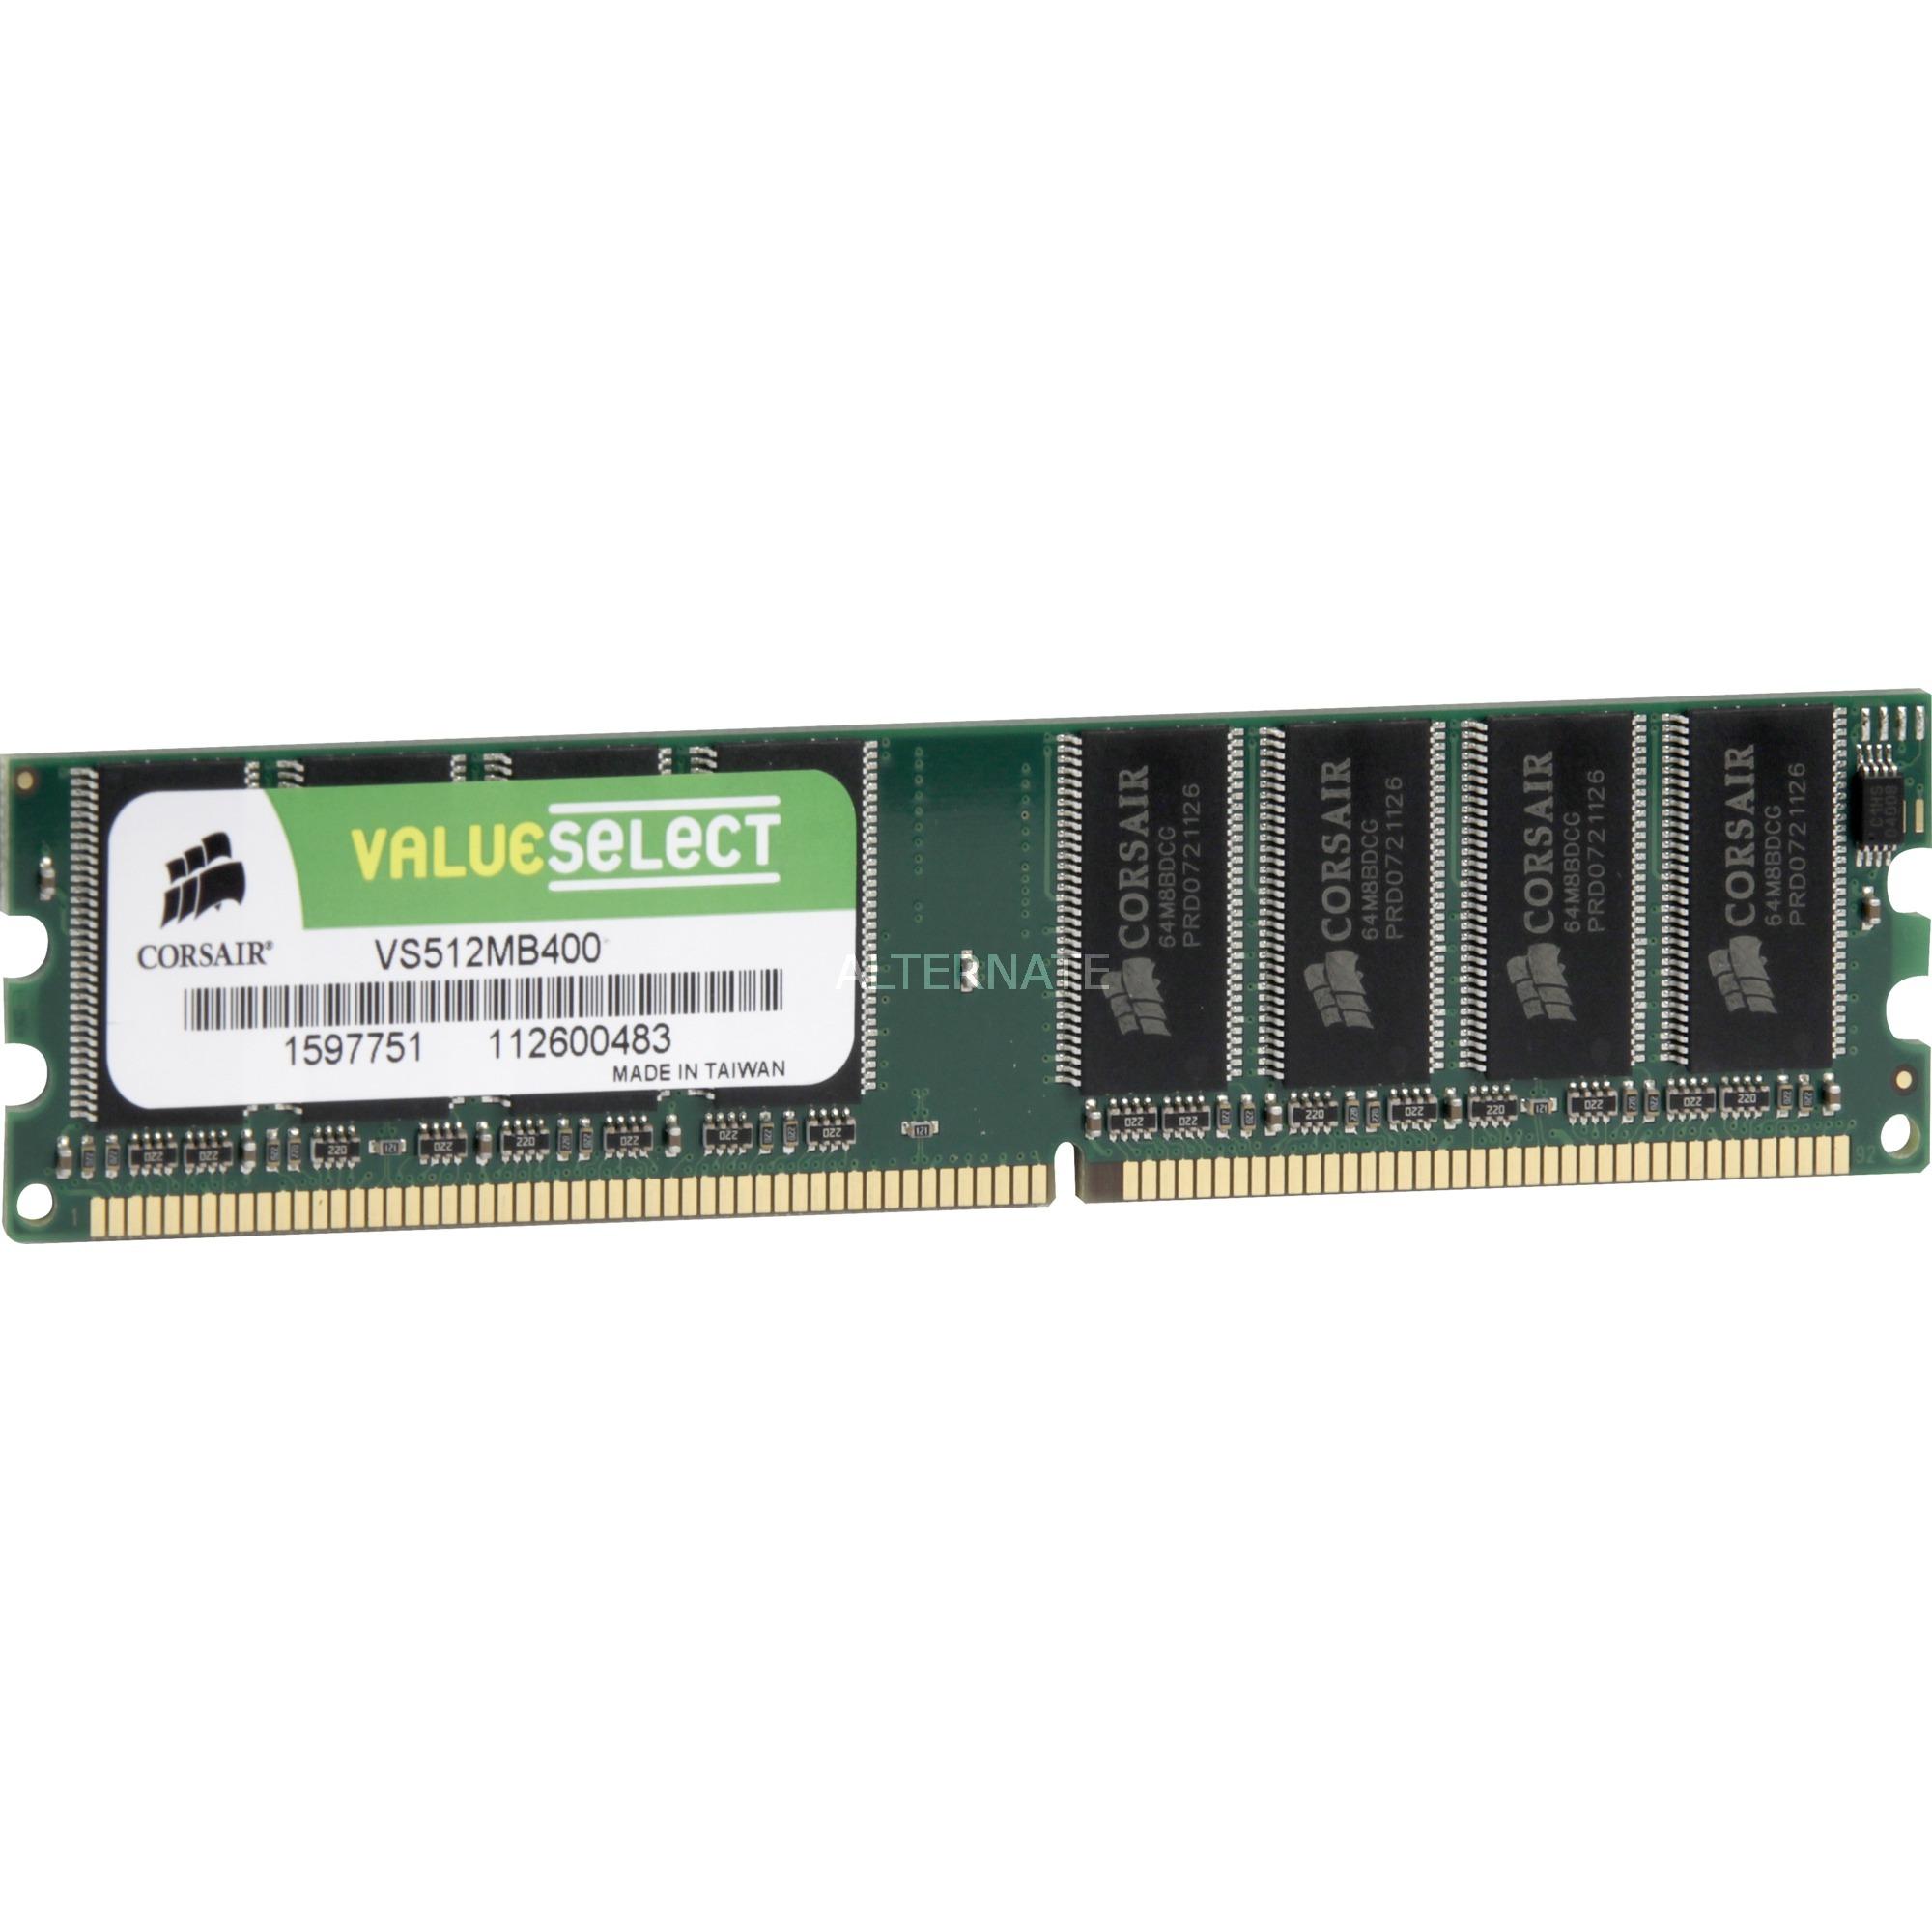 512MB PC3200 SDRAM DIMM módulo de memoria 0,5 GB DDR 400 MHz, Memoria RAM